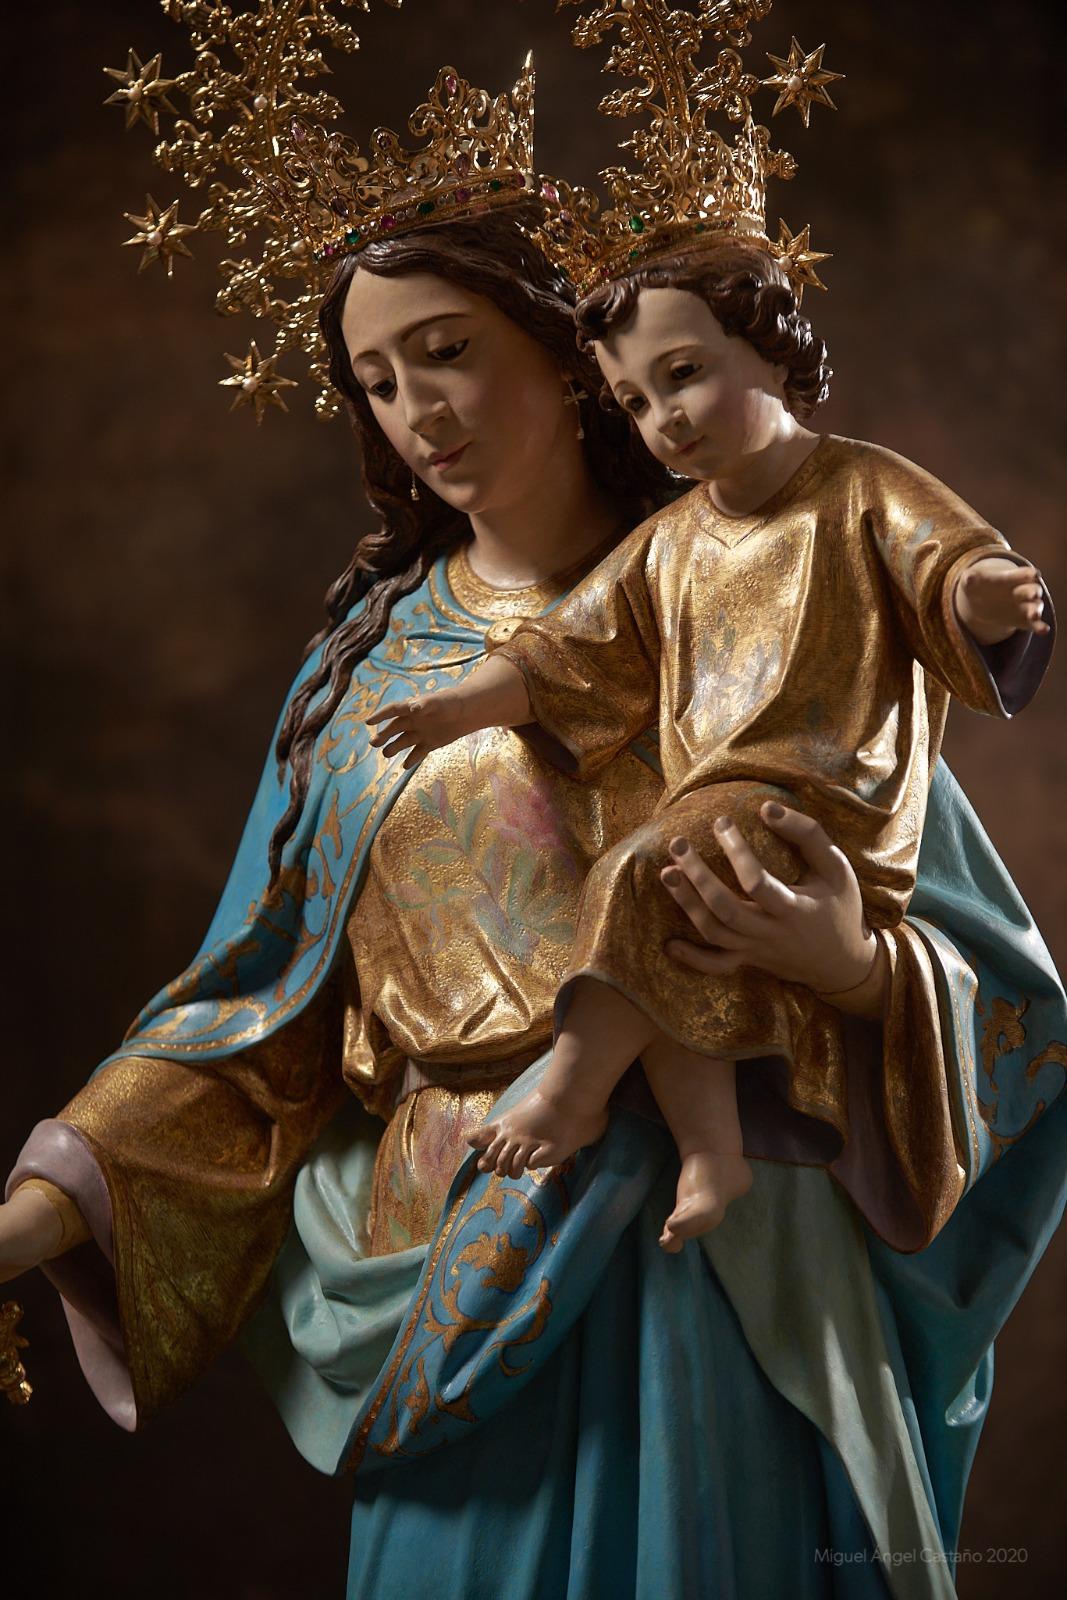 Veneración extraordinaria a María Auxiliadora en Jerez